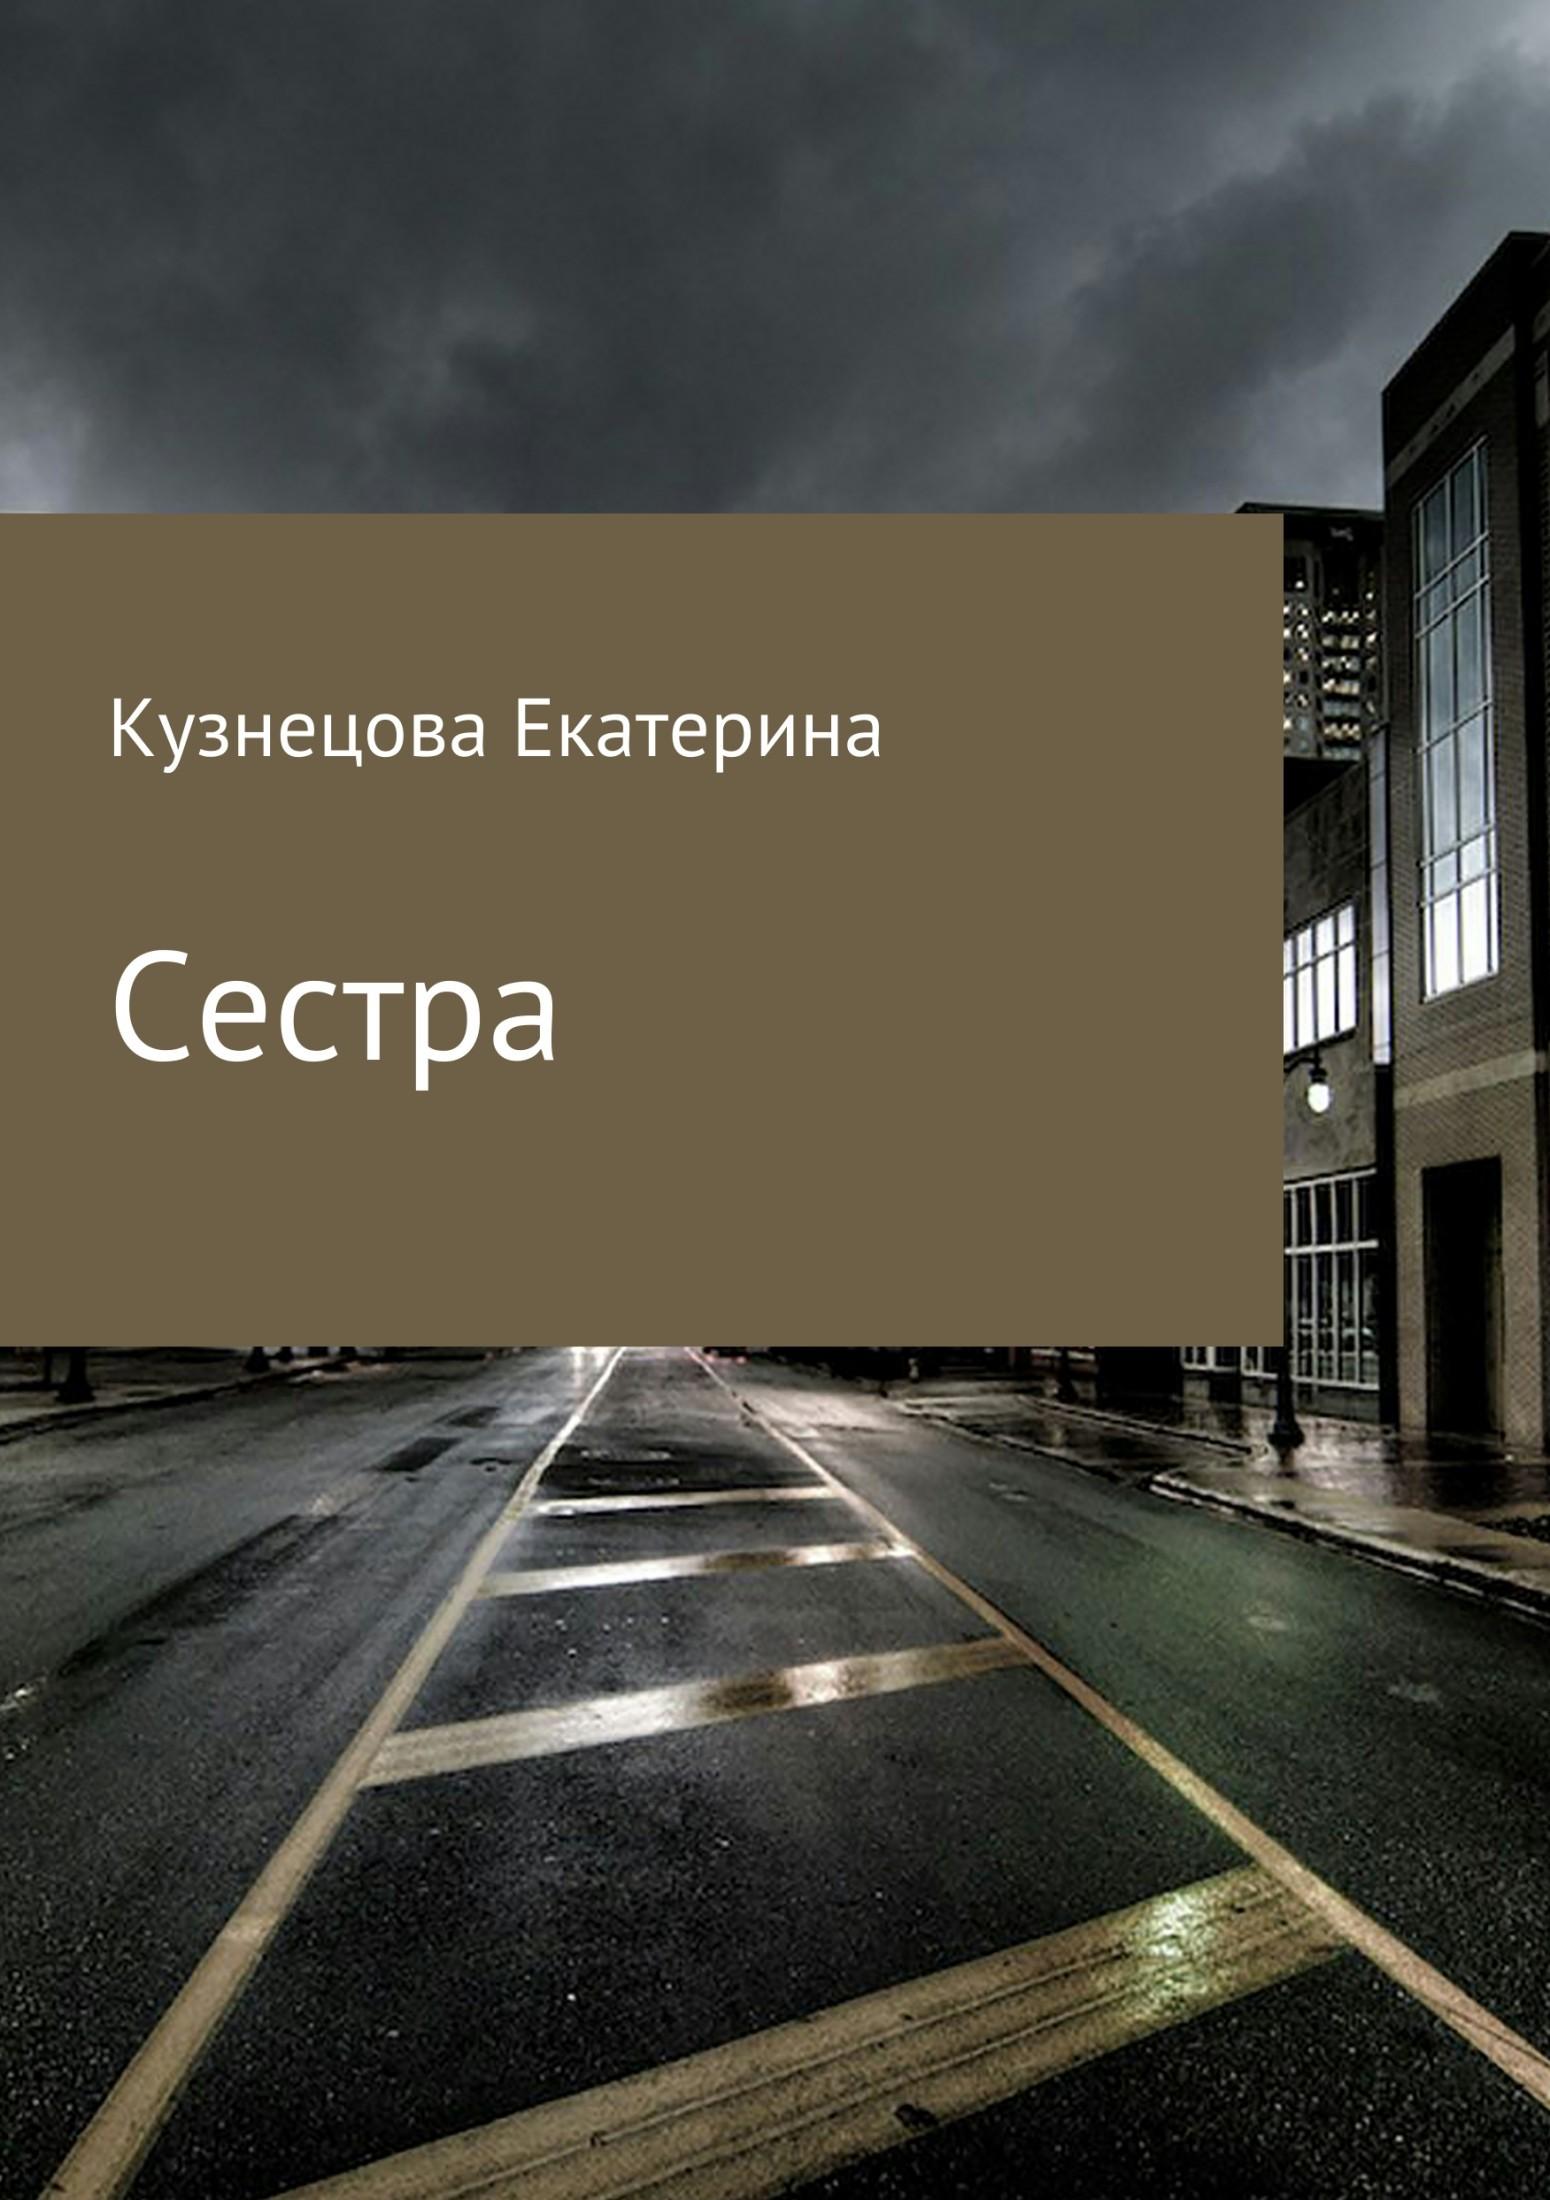 Екатерина Викторовна Кузнецова Сестра гордон екатерина викторовна стихикатигордон